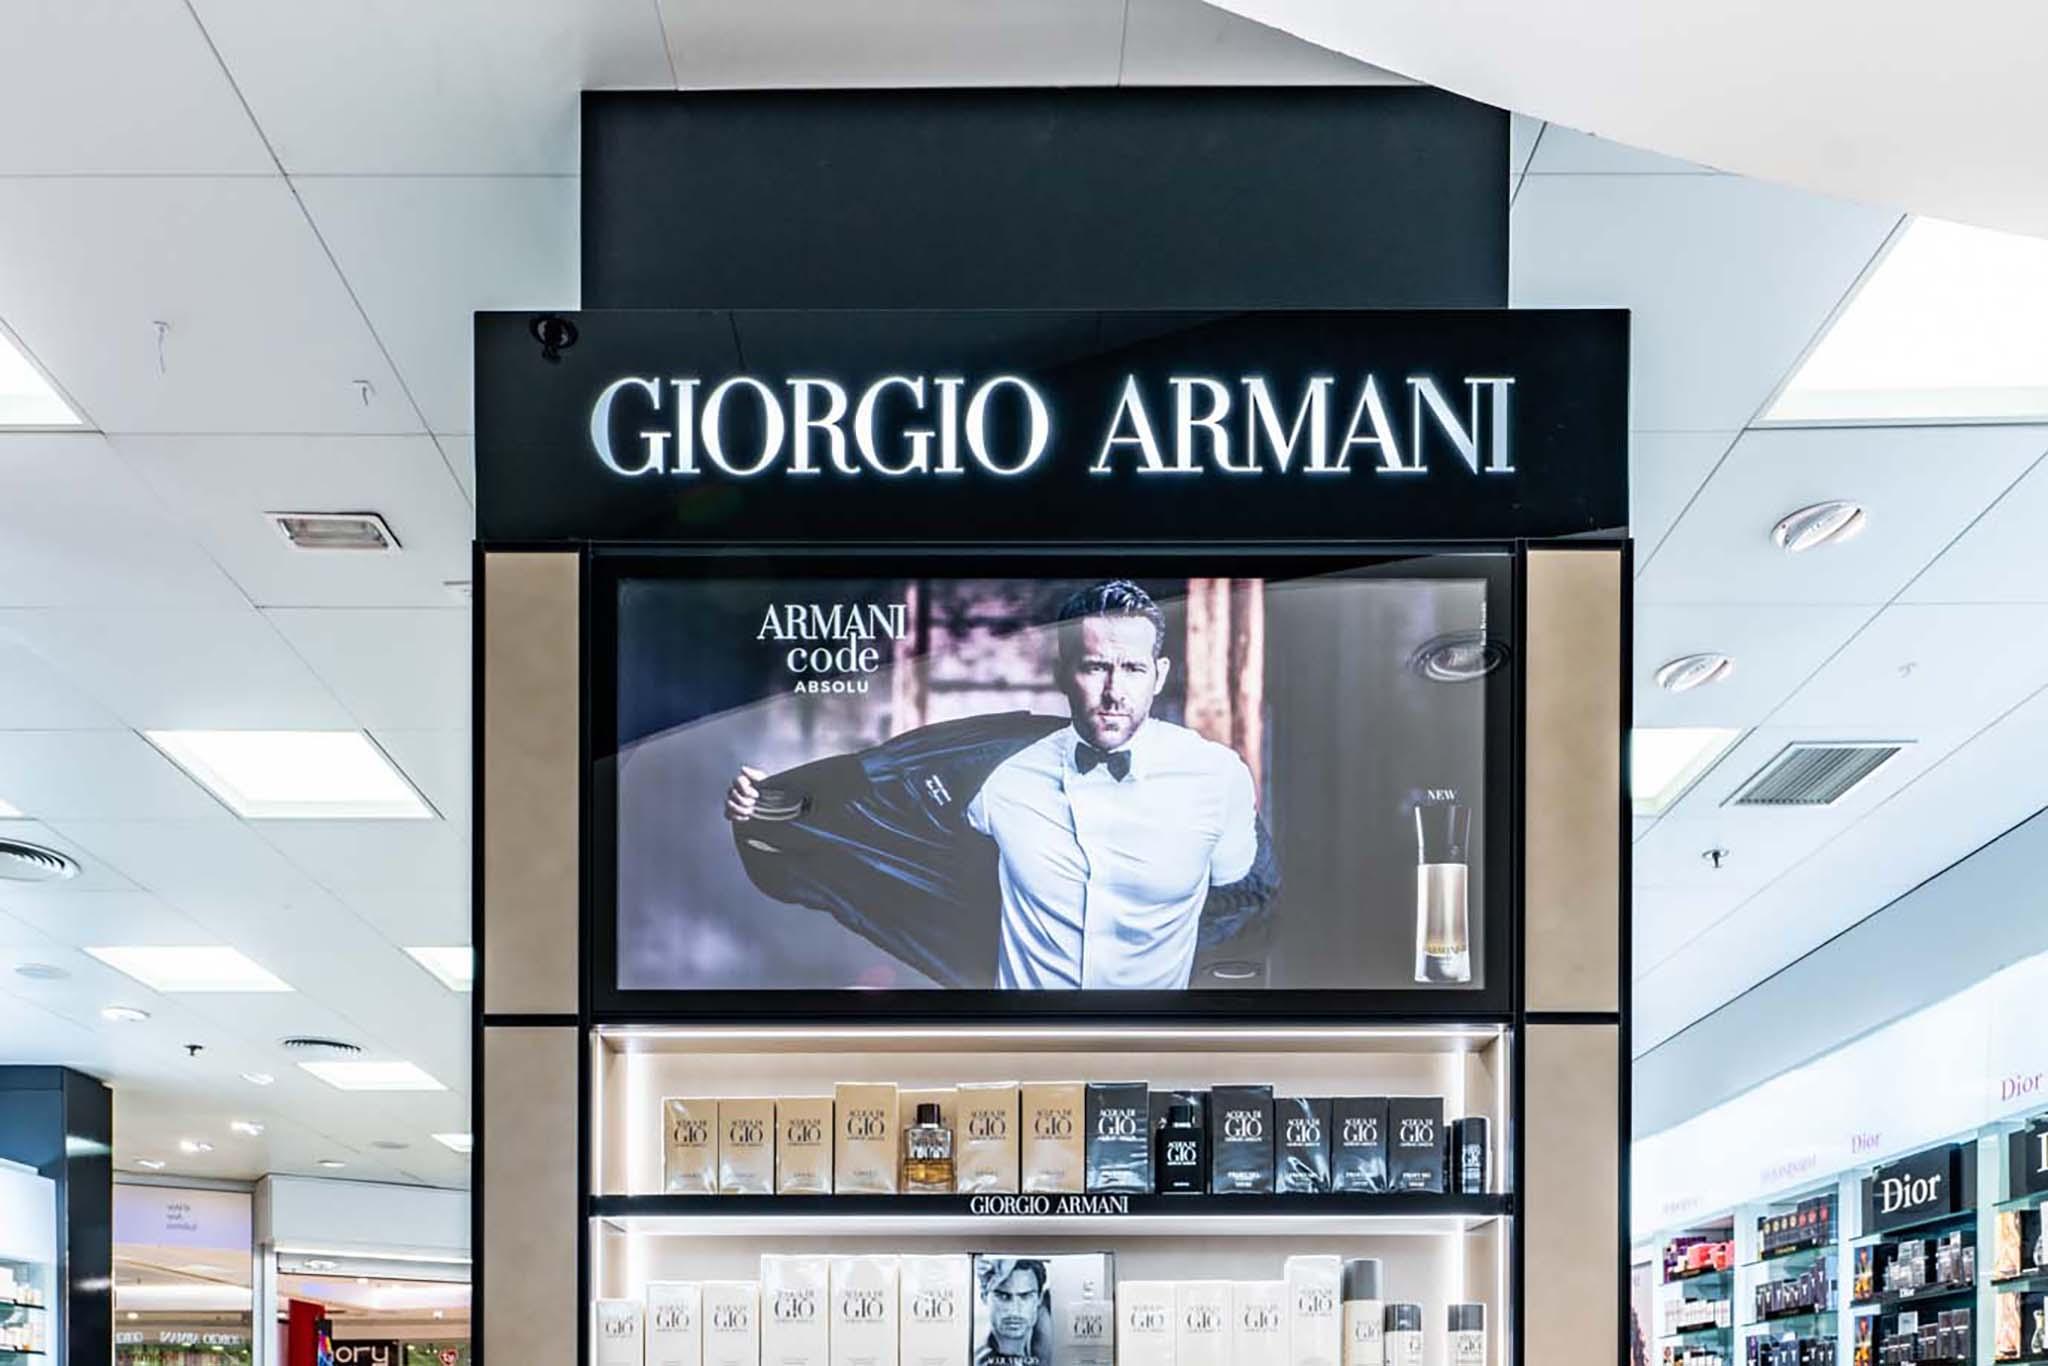 Columna Armani (Ryan Raynolds)